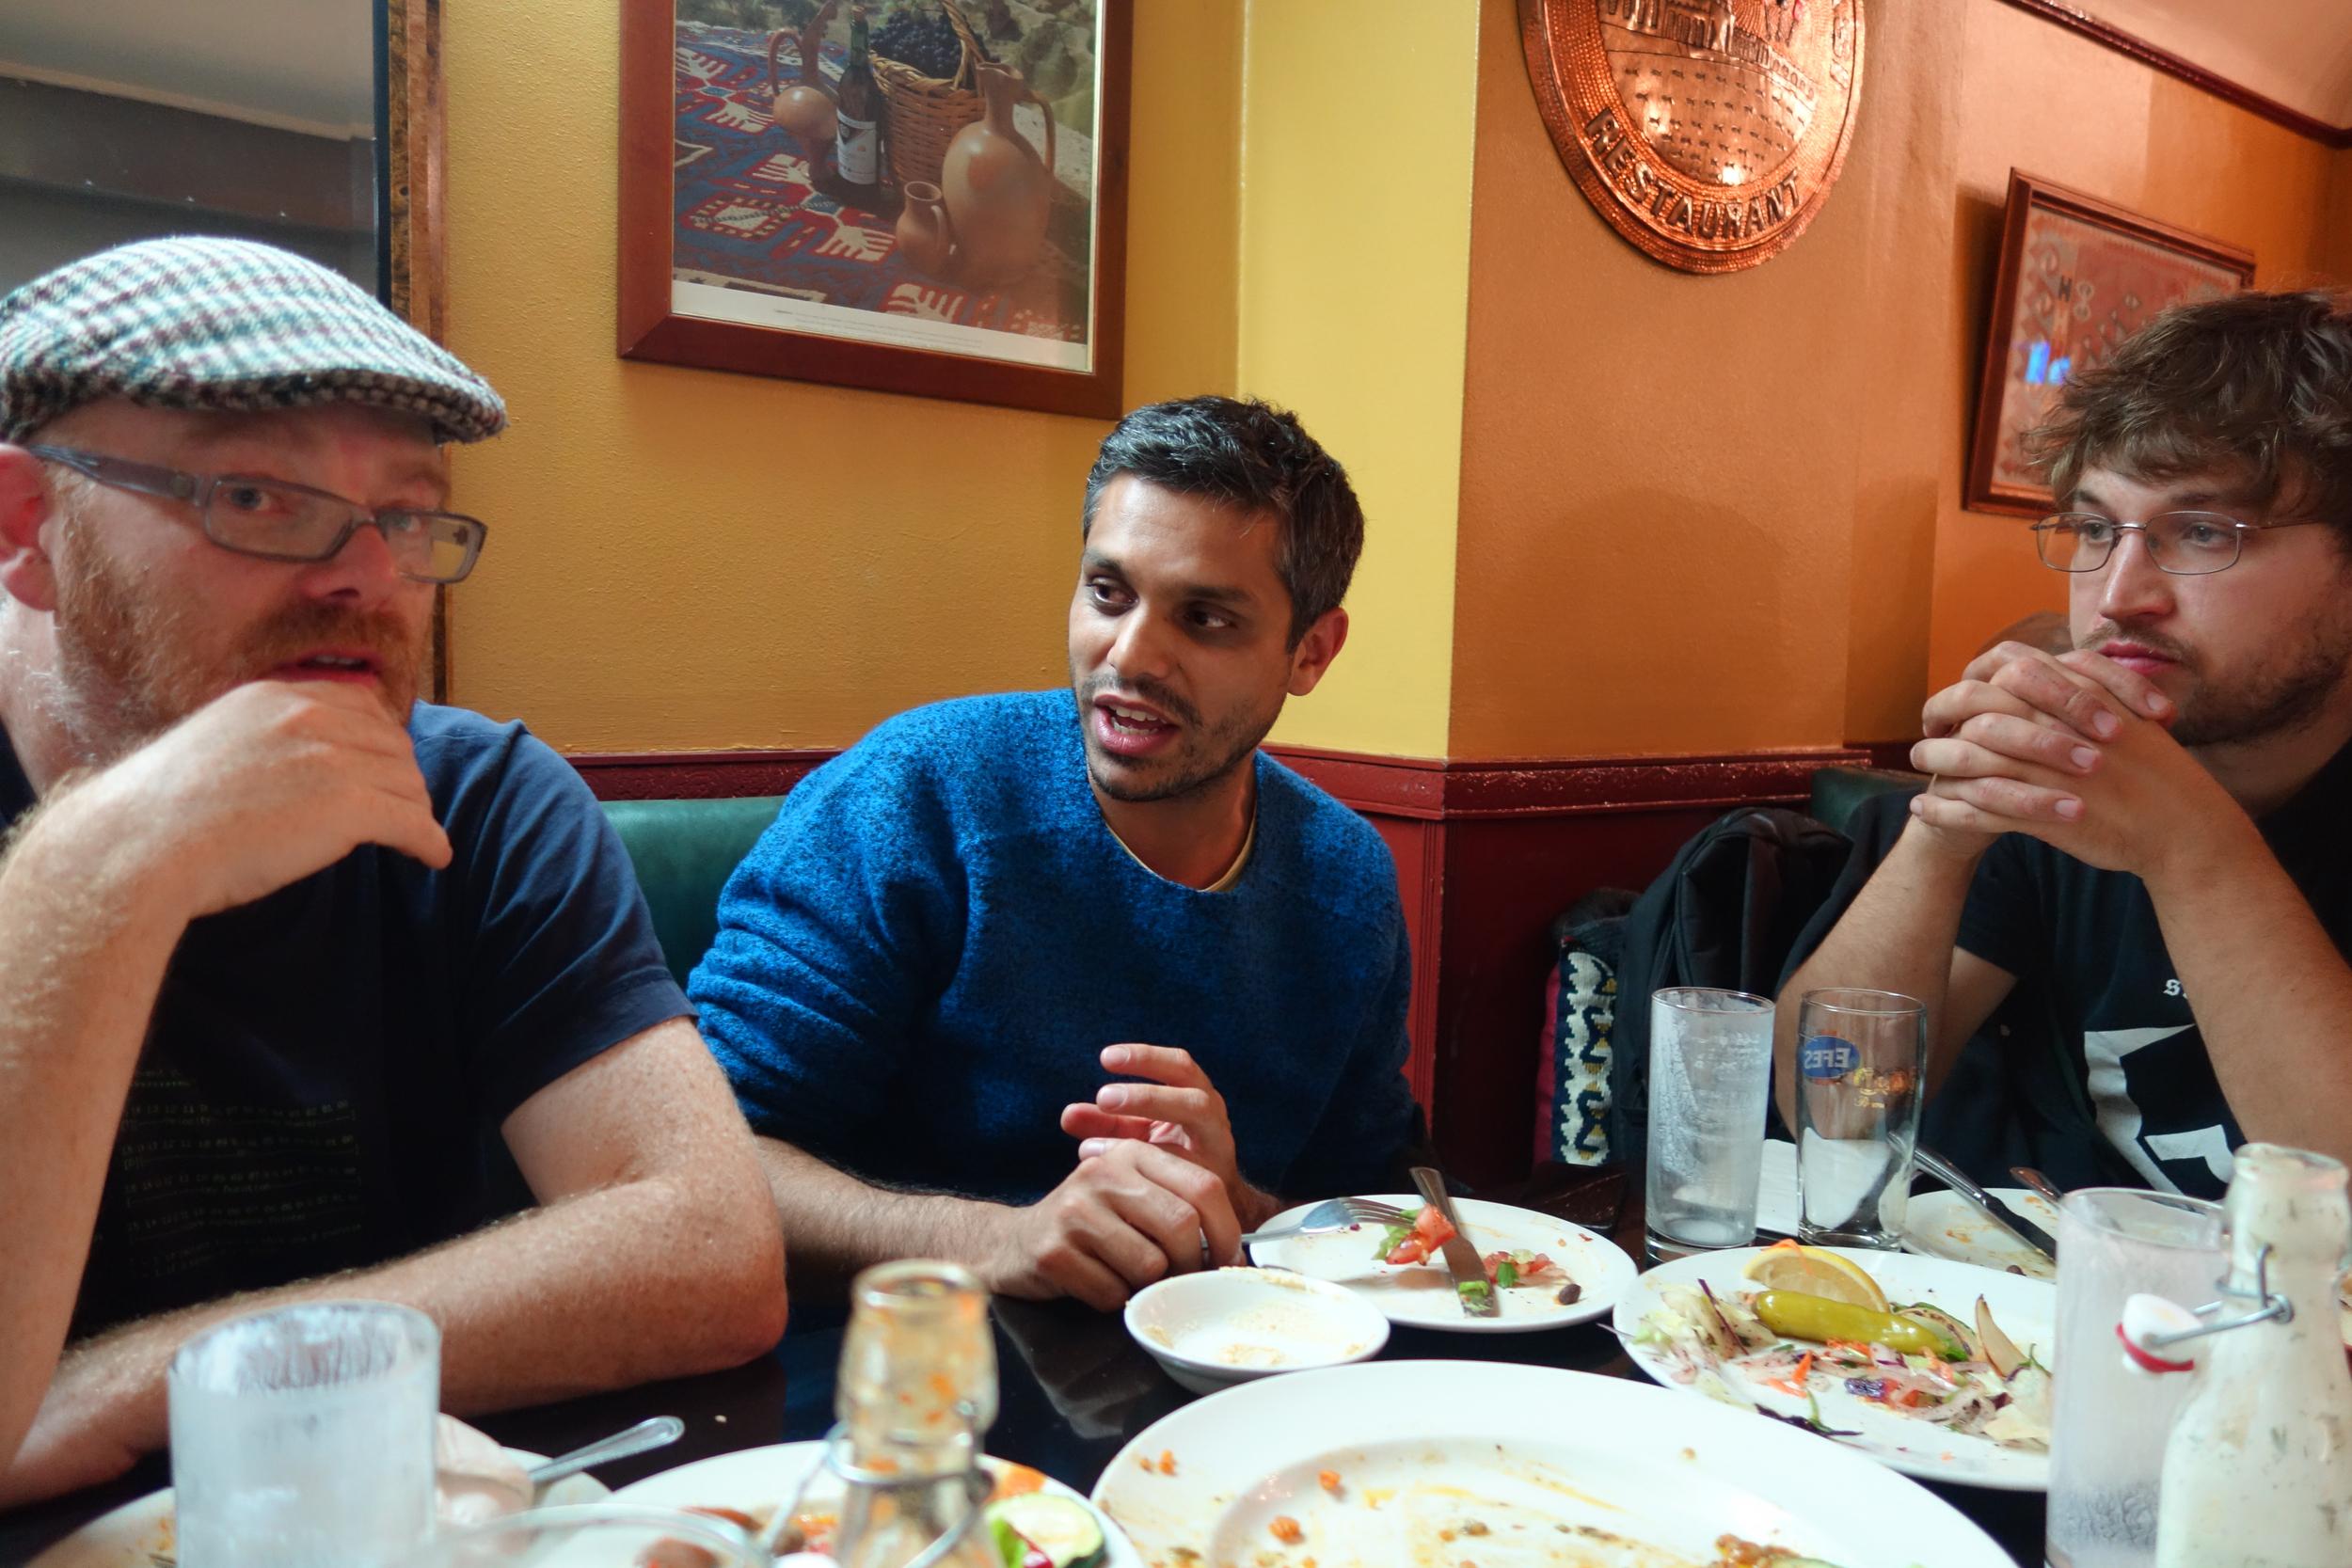 Had a really nice meal at Mangal with Mark, Harun Mirza, Richard Sides, and Thomas before the gig.